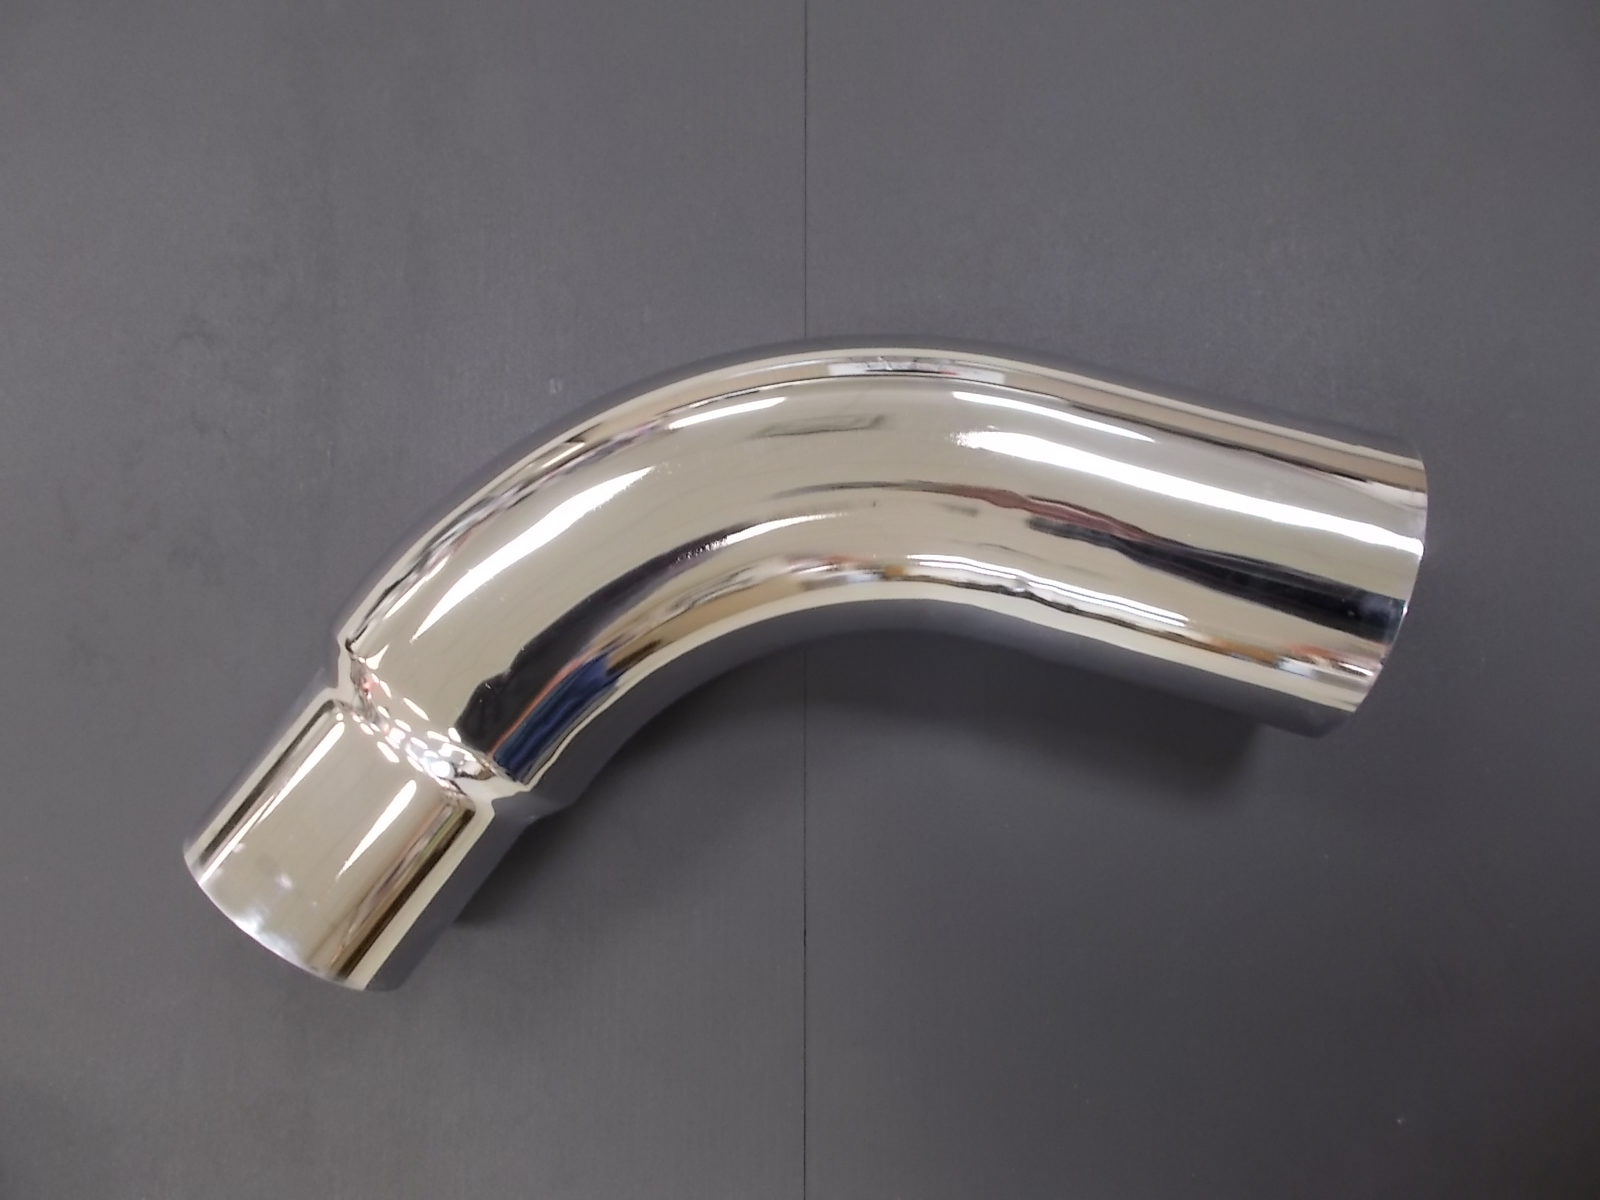 dirks1444 peterbilt 359 chrome exhaust elbow 6 reducing to 5